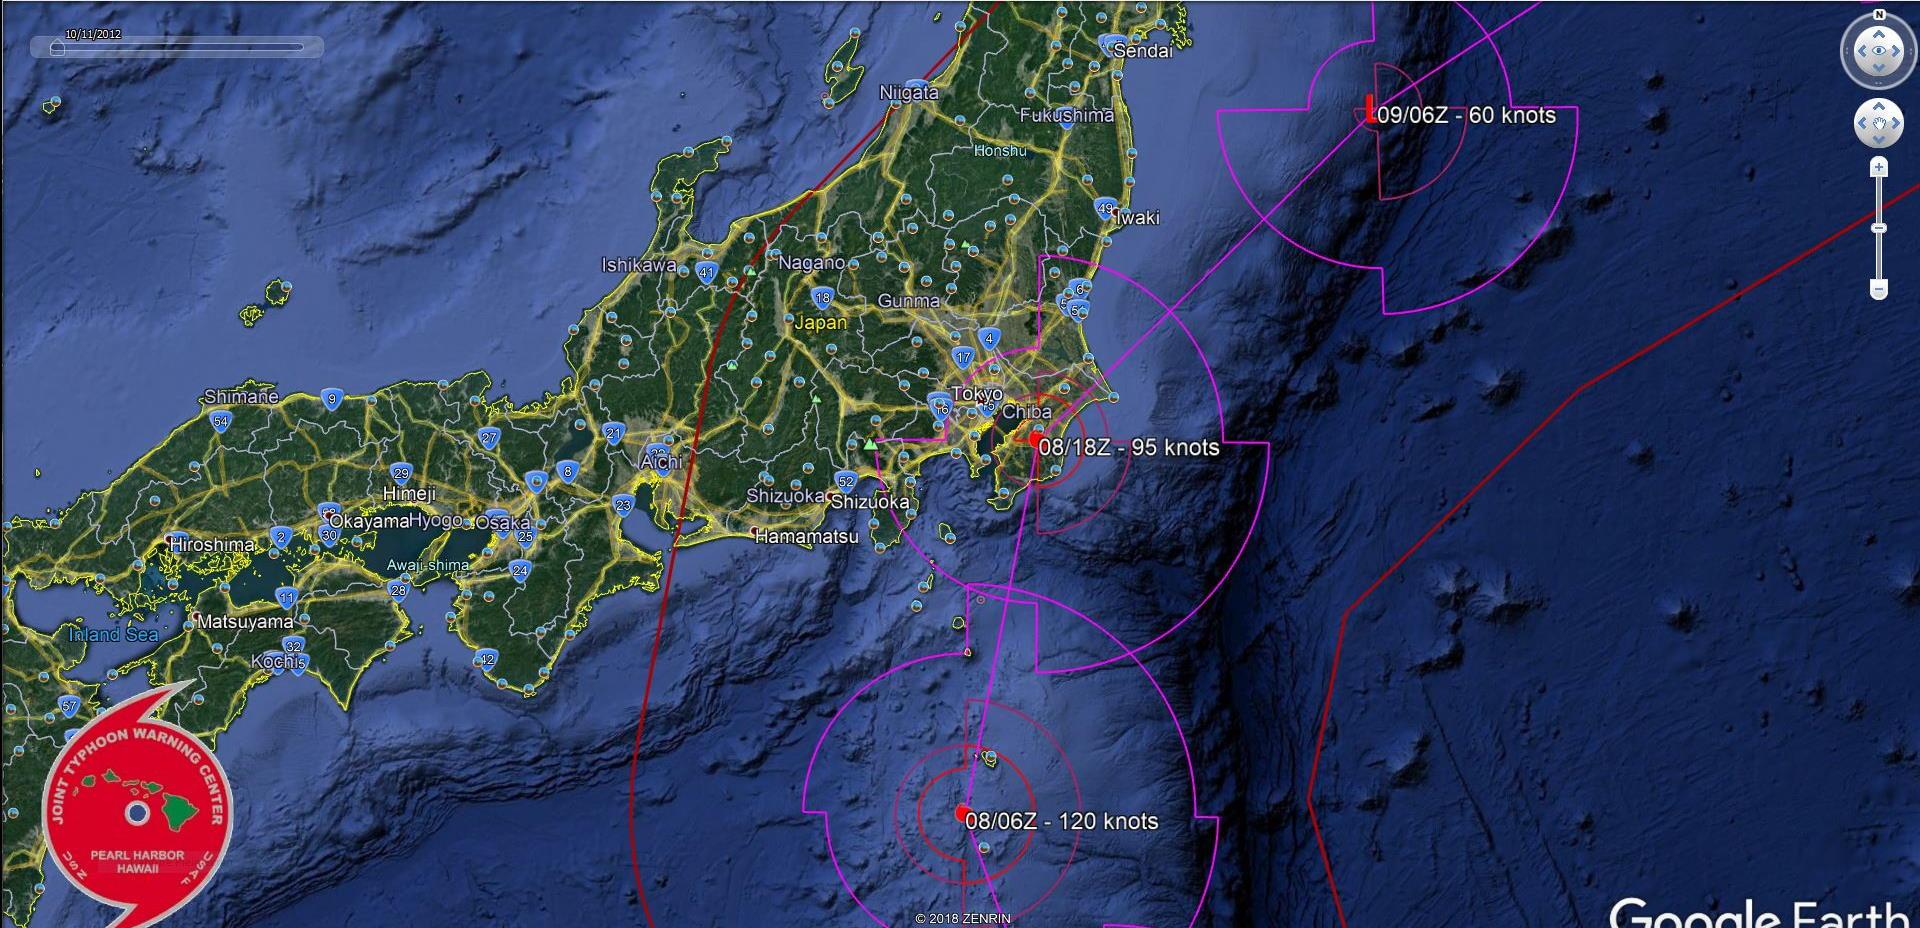 FORECAST TRACK NEAR TOKYO